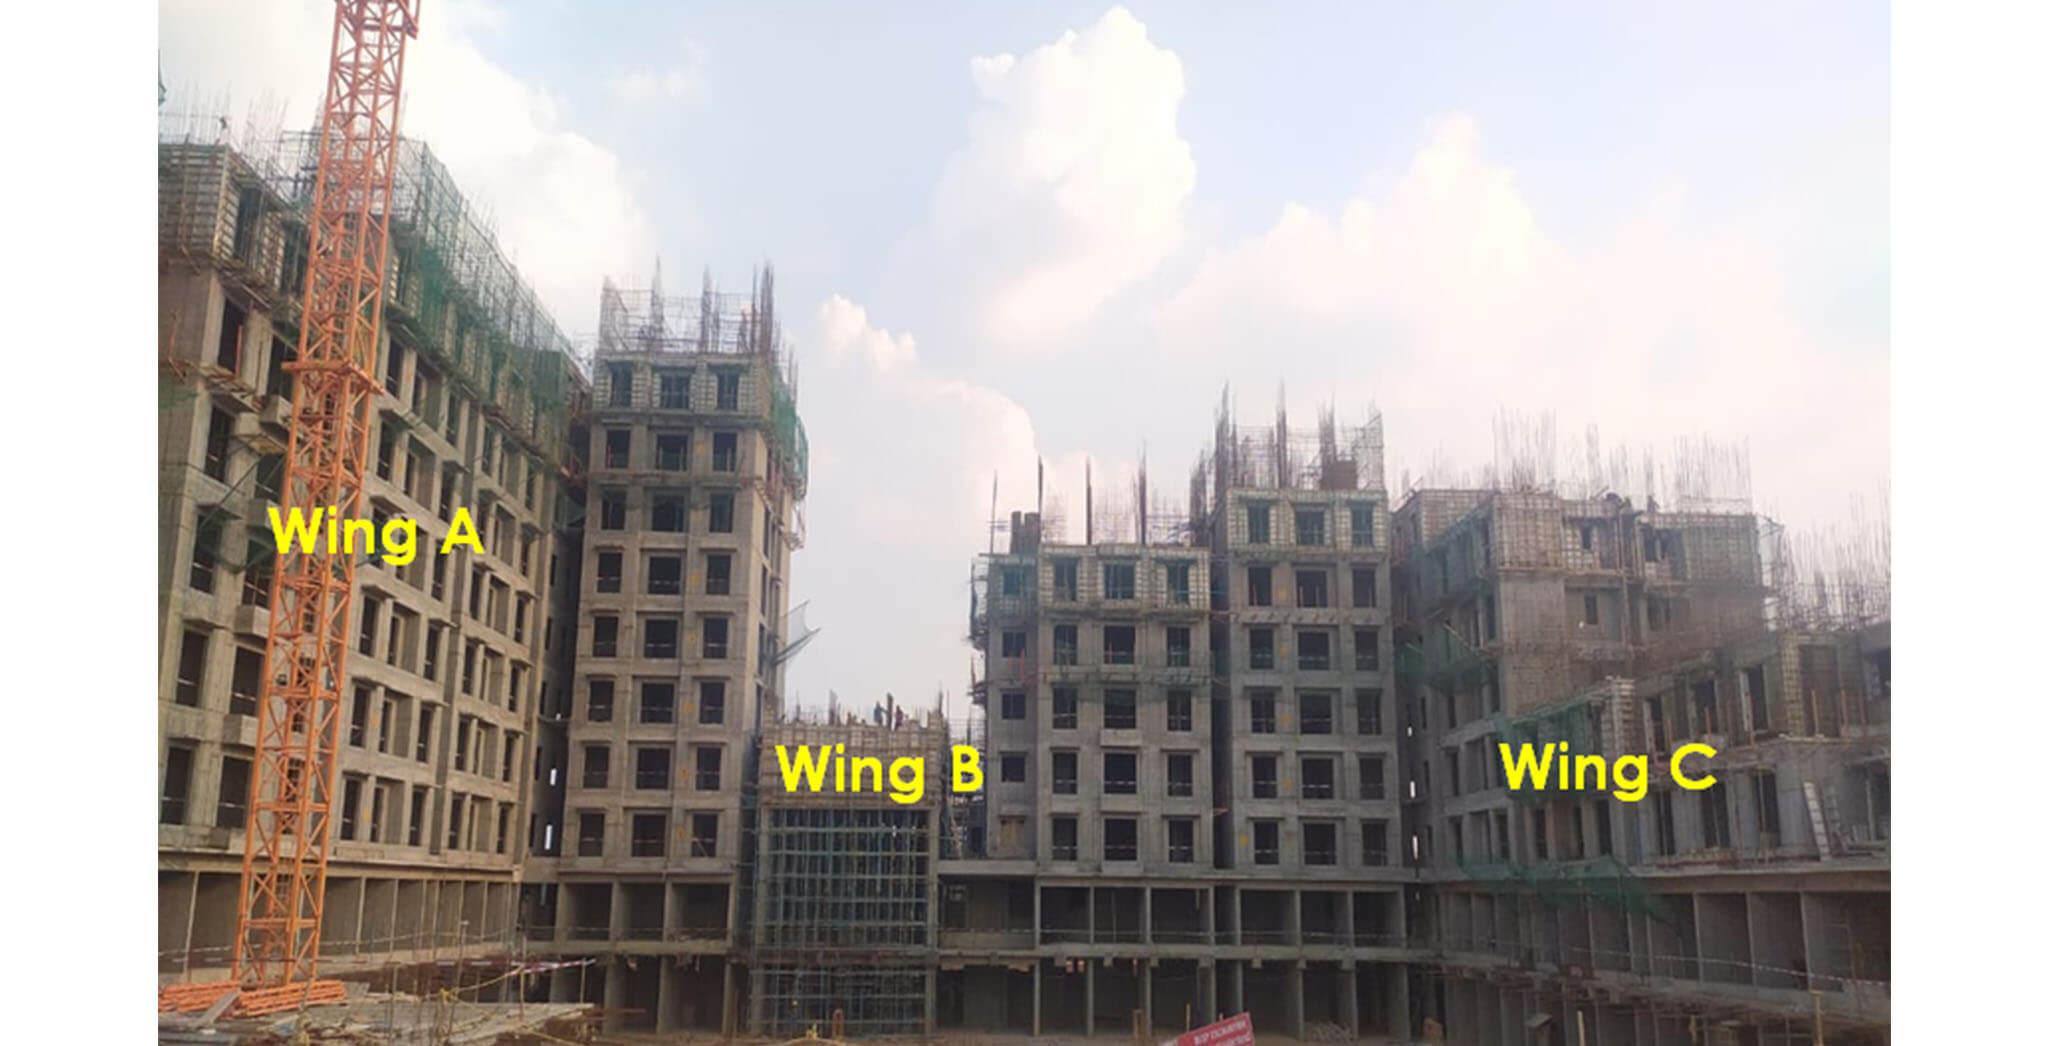 Apr 2021 - Helio Block: North elevation—Overall progress